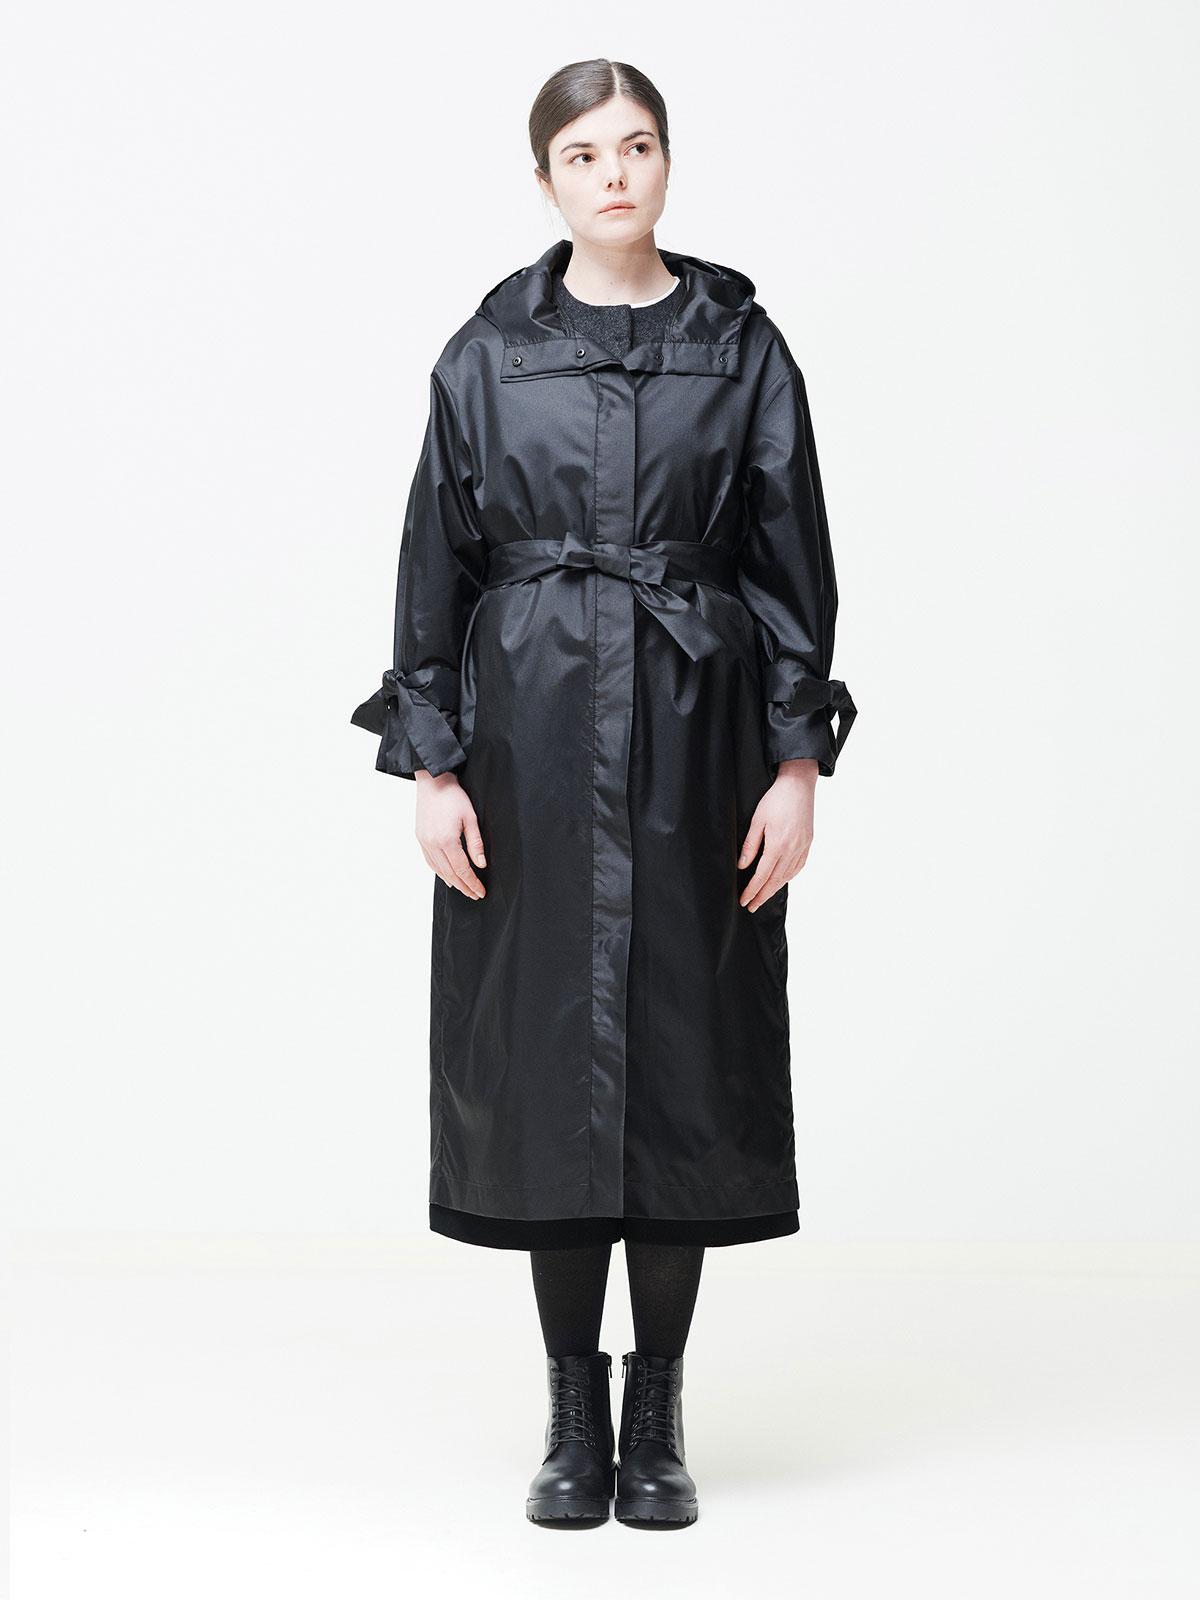 Garderob050558 C